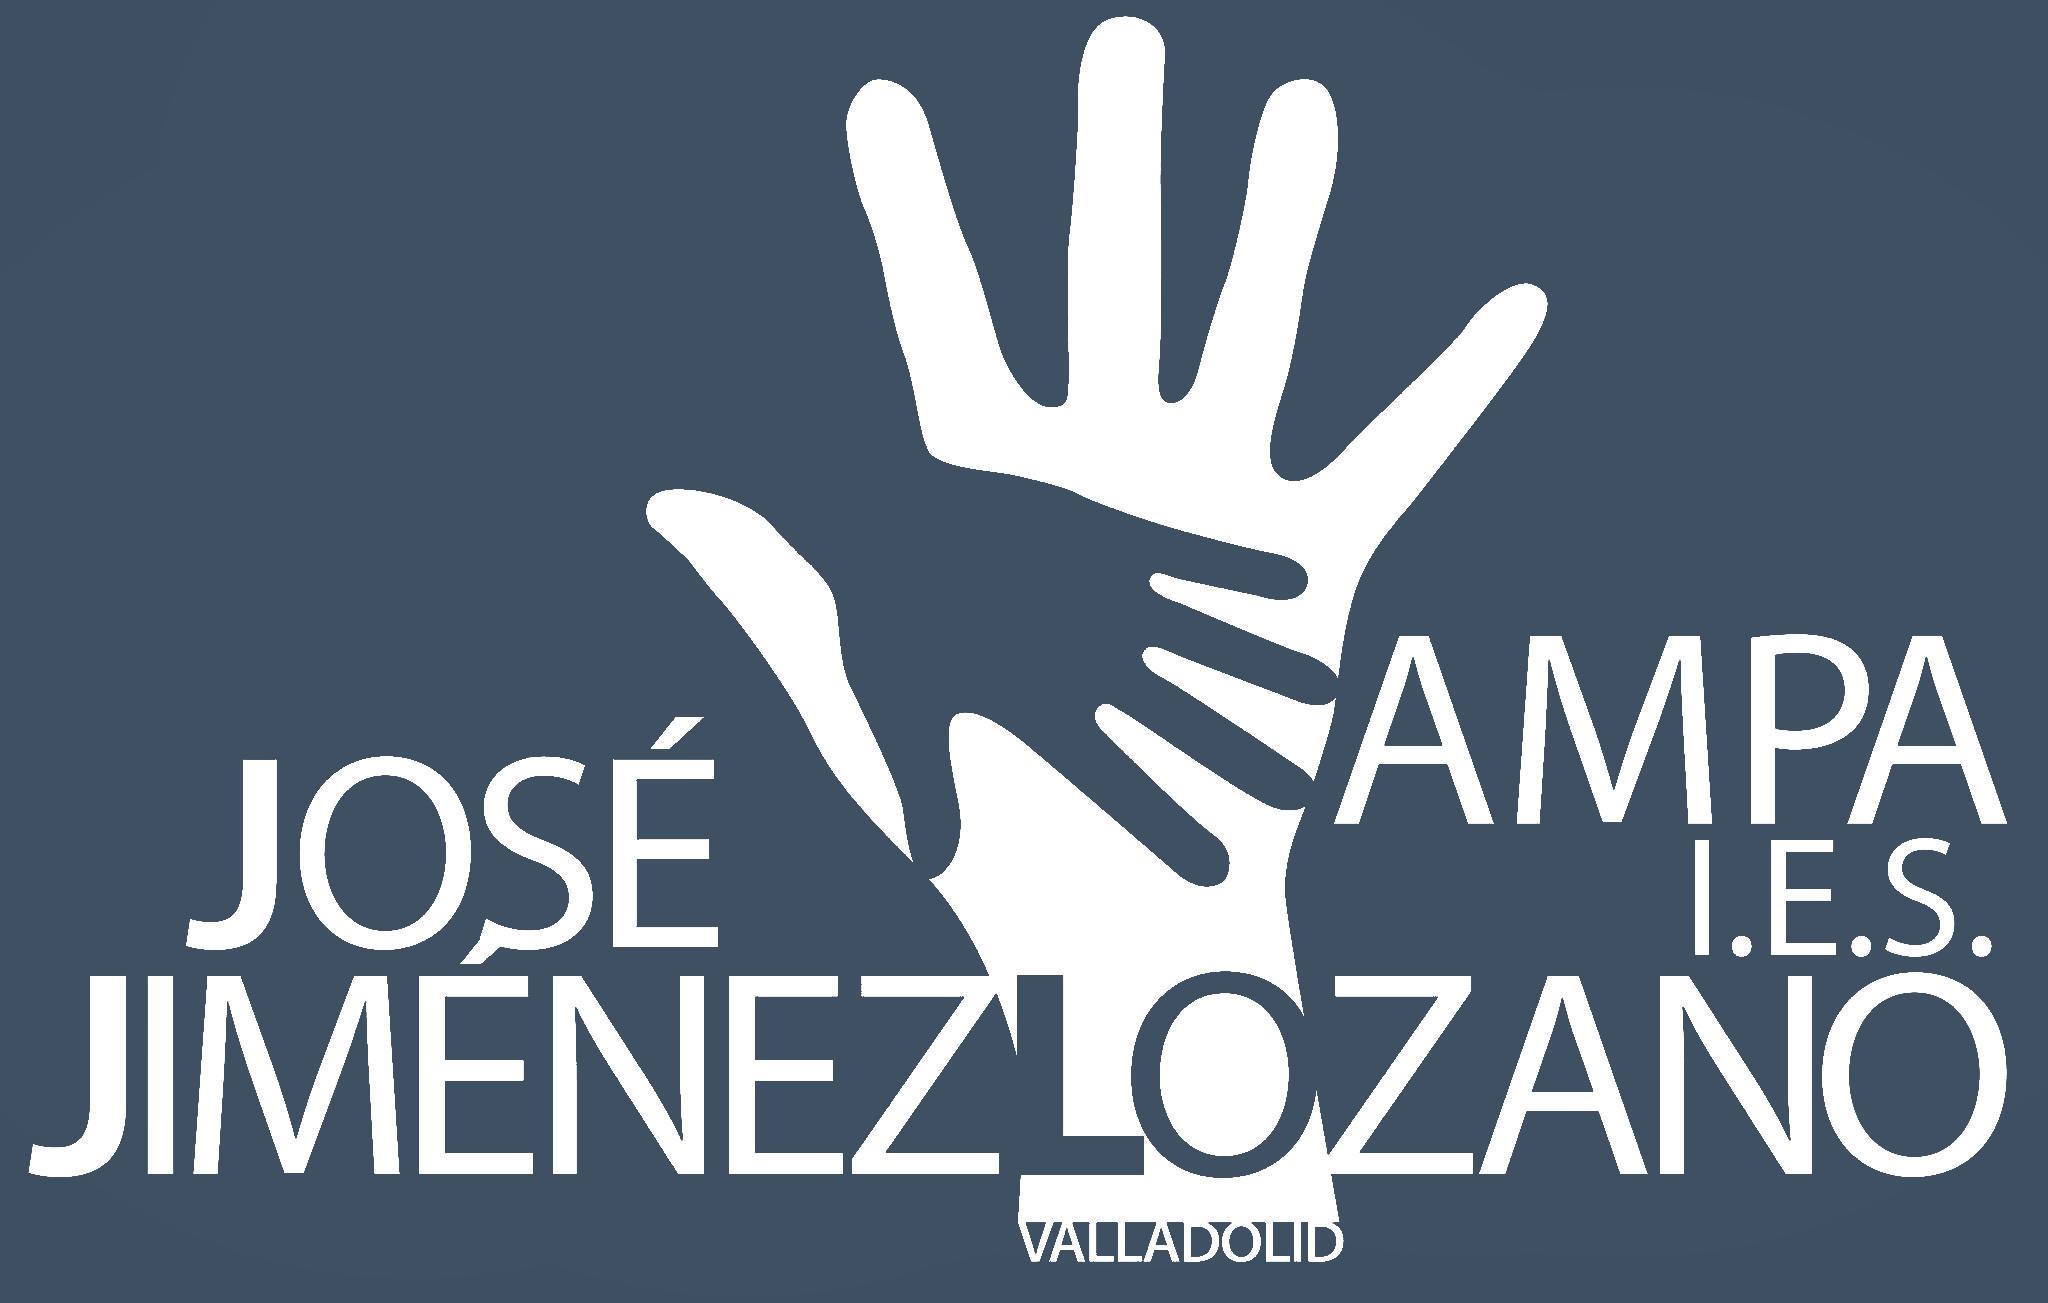 AMPA IES José Jimenez Lozano